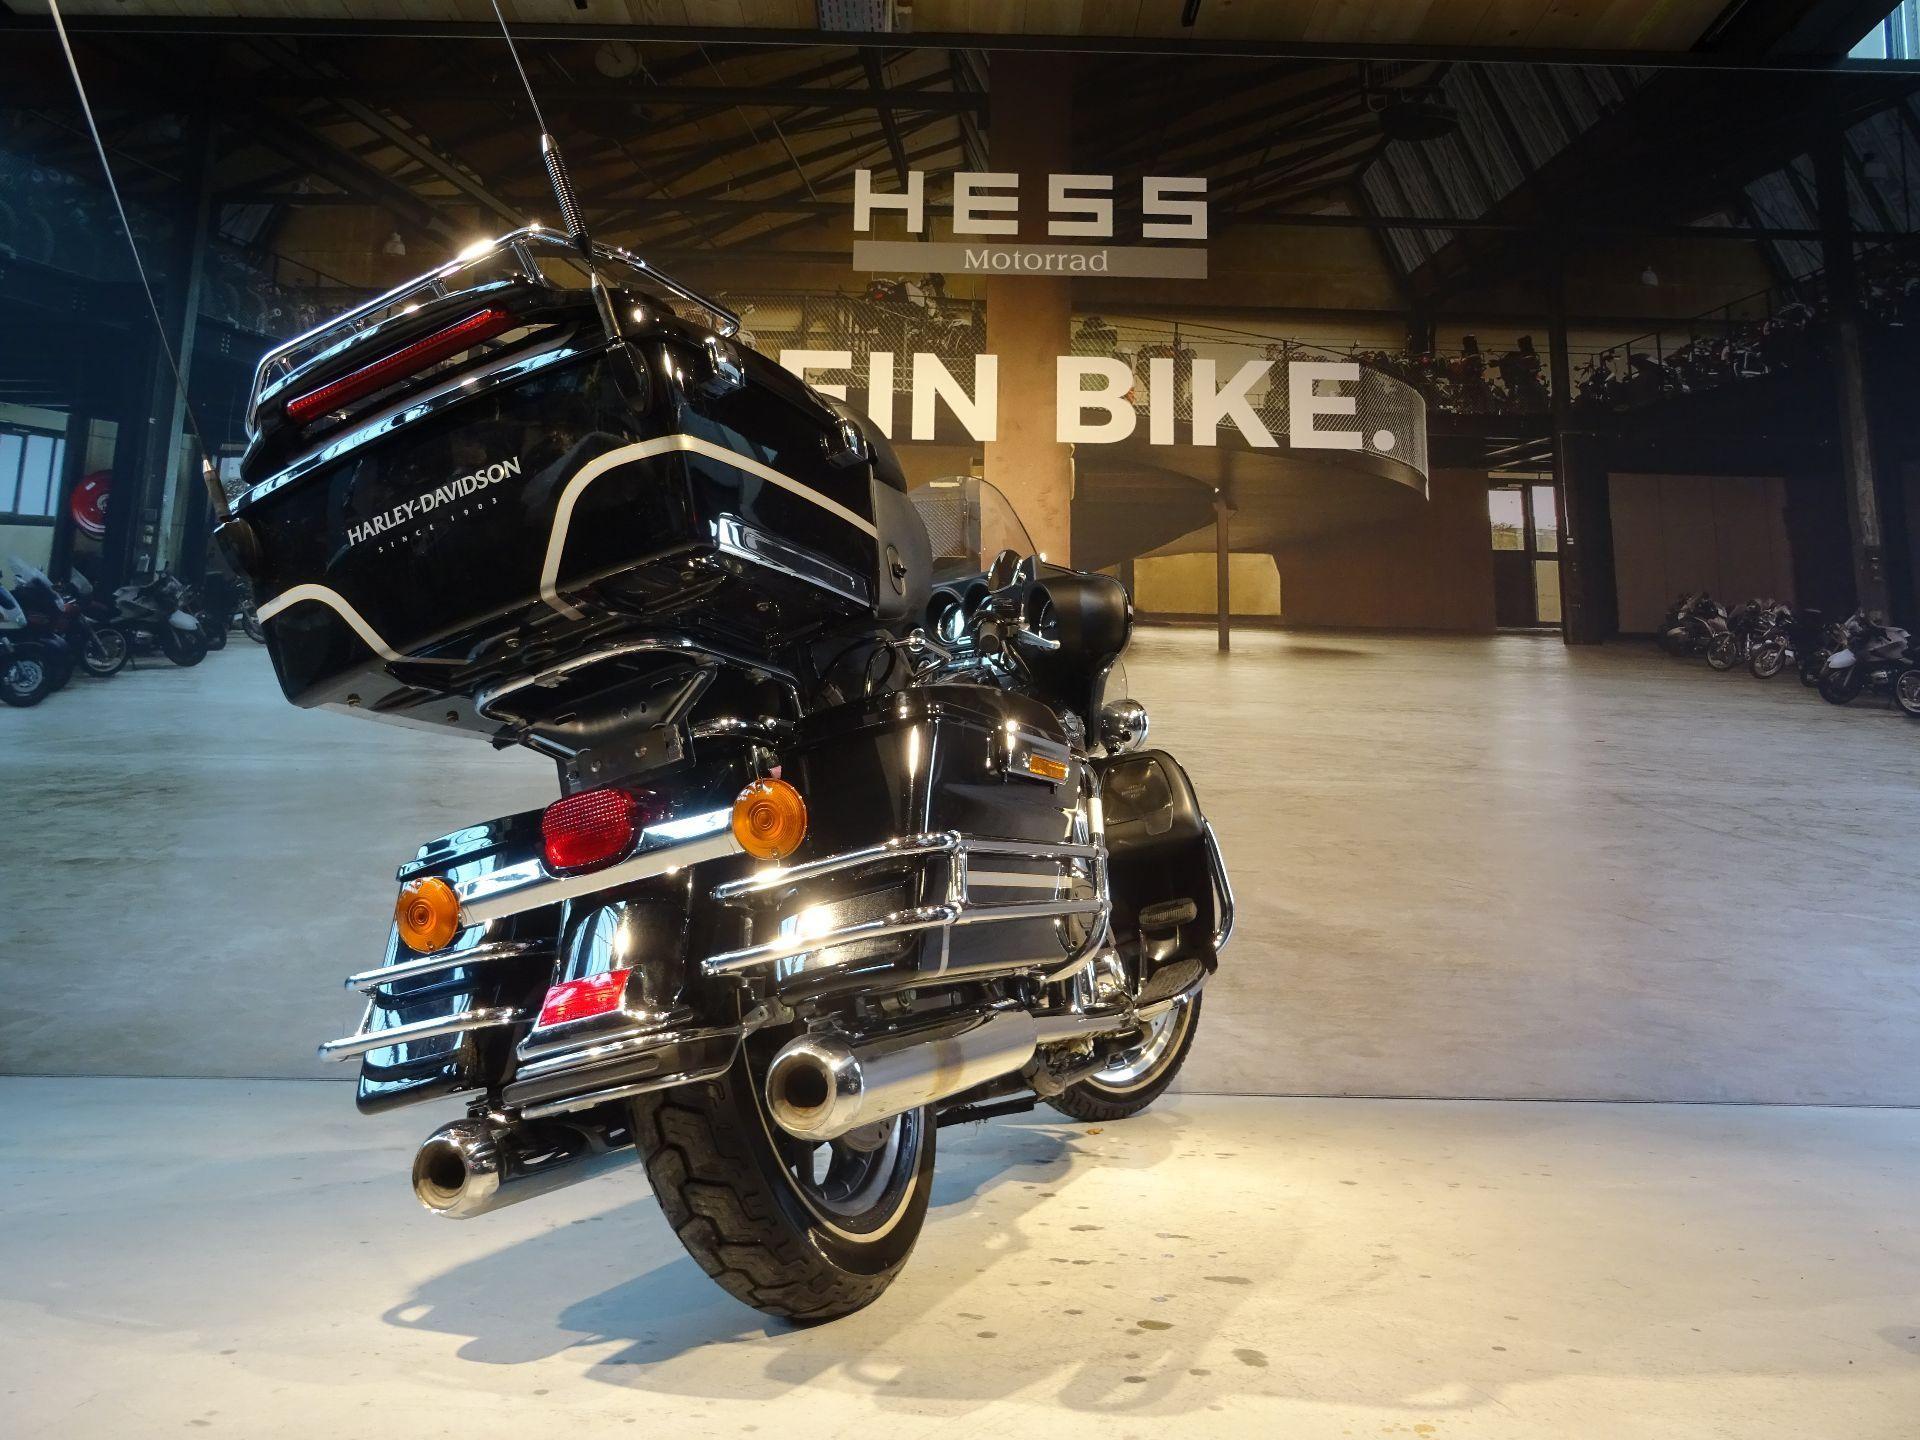 moto occasions acheter harley davidson flhtcui 1450 electra glide ultra classic hess motorrad. Black Bedroom Furniture Sets. Home Design Ideas